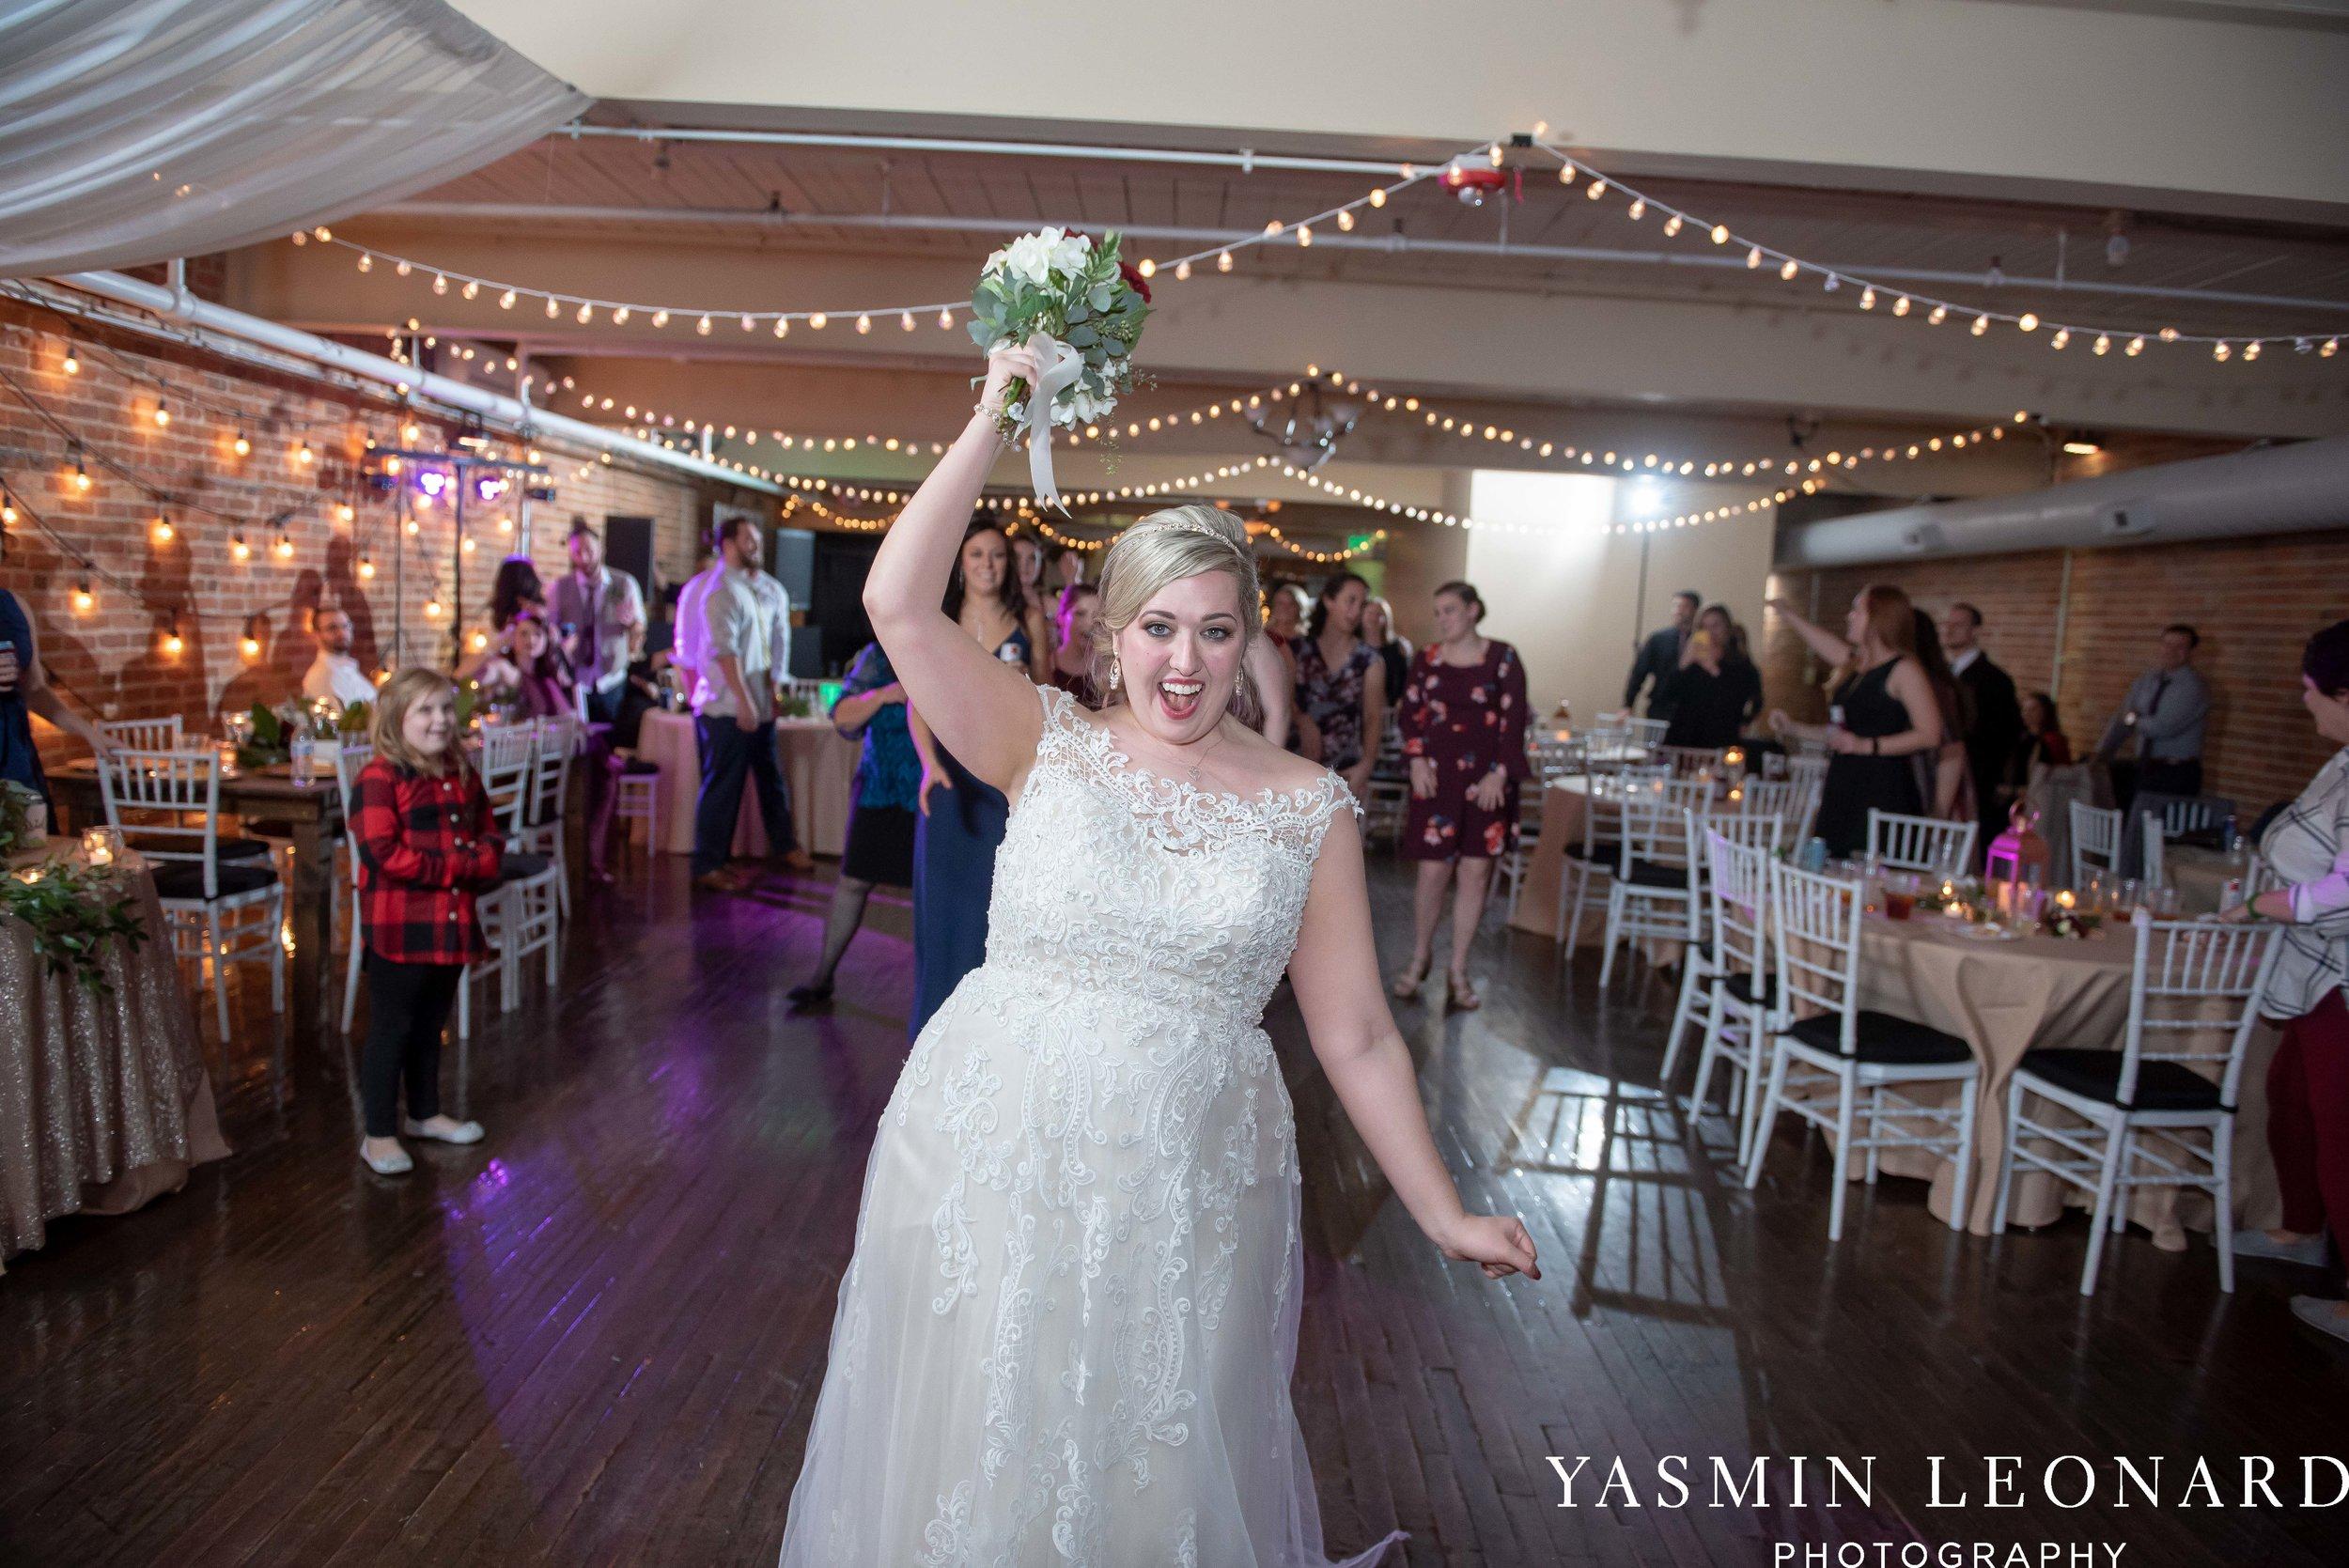 Rebekah and Matt - 105 Worth Event Centre - Yasmin Leonard Photography - Asheboro Wedding - NC Wedding - High Point Weddings - Triad Weddings - Winter Wedding-64.jpg